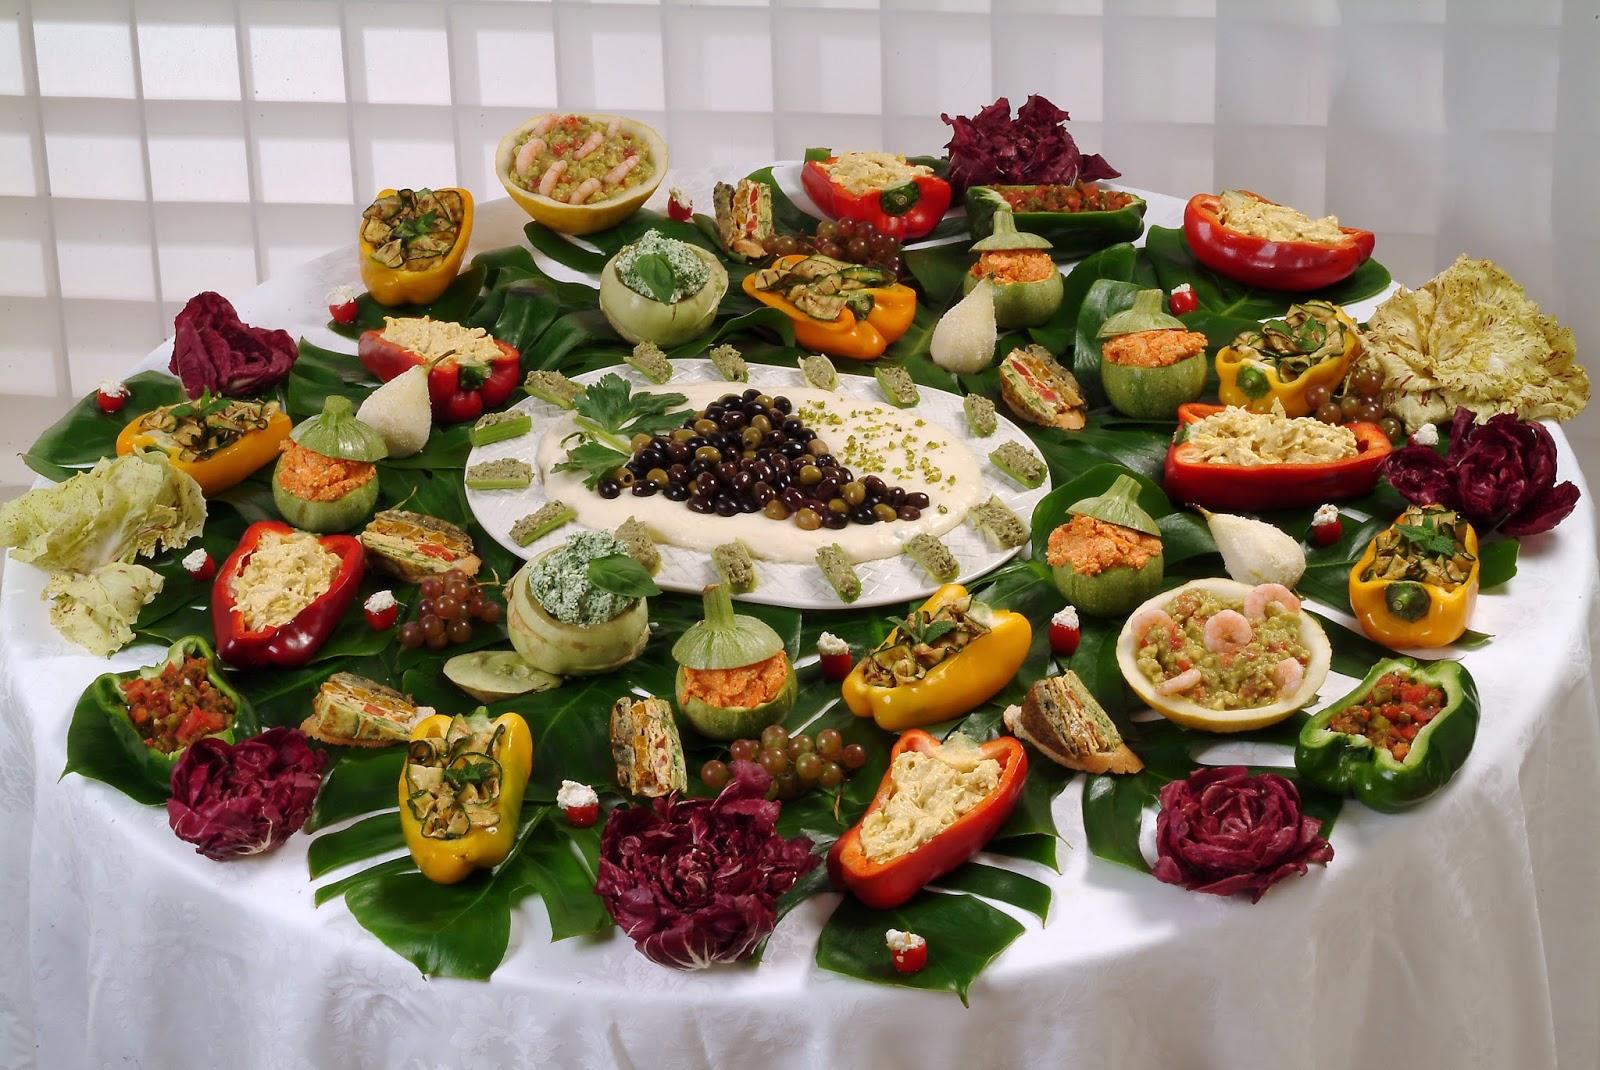 E orchestra di cucina: buffet per una serata estiva